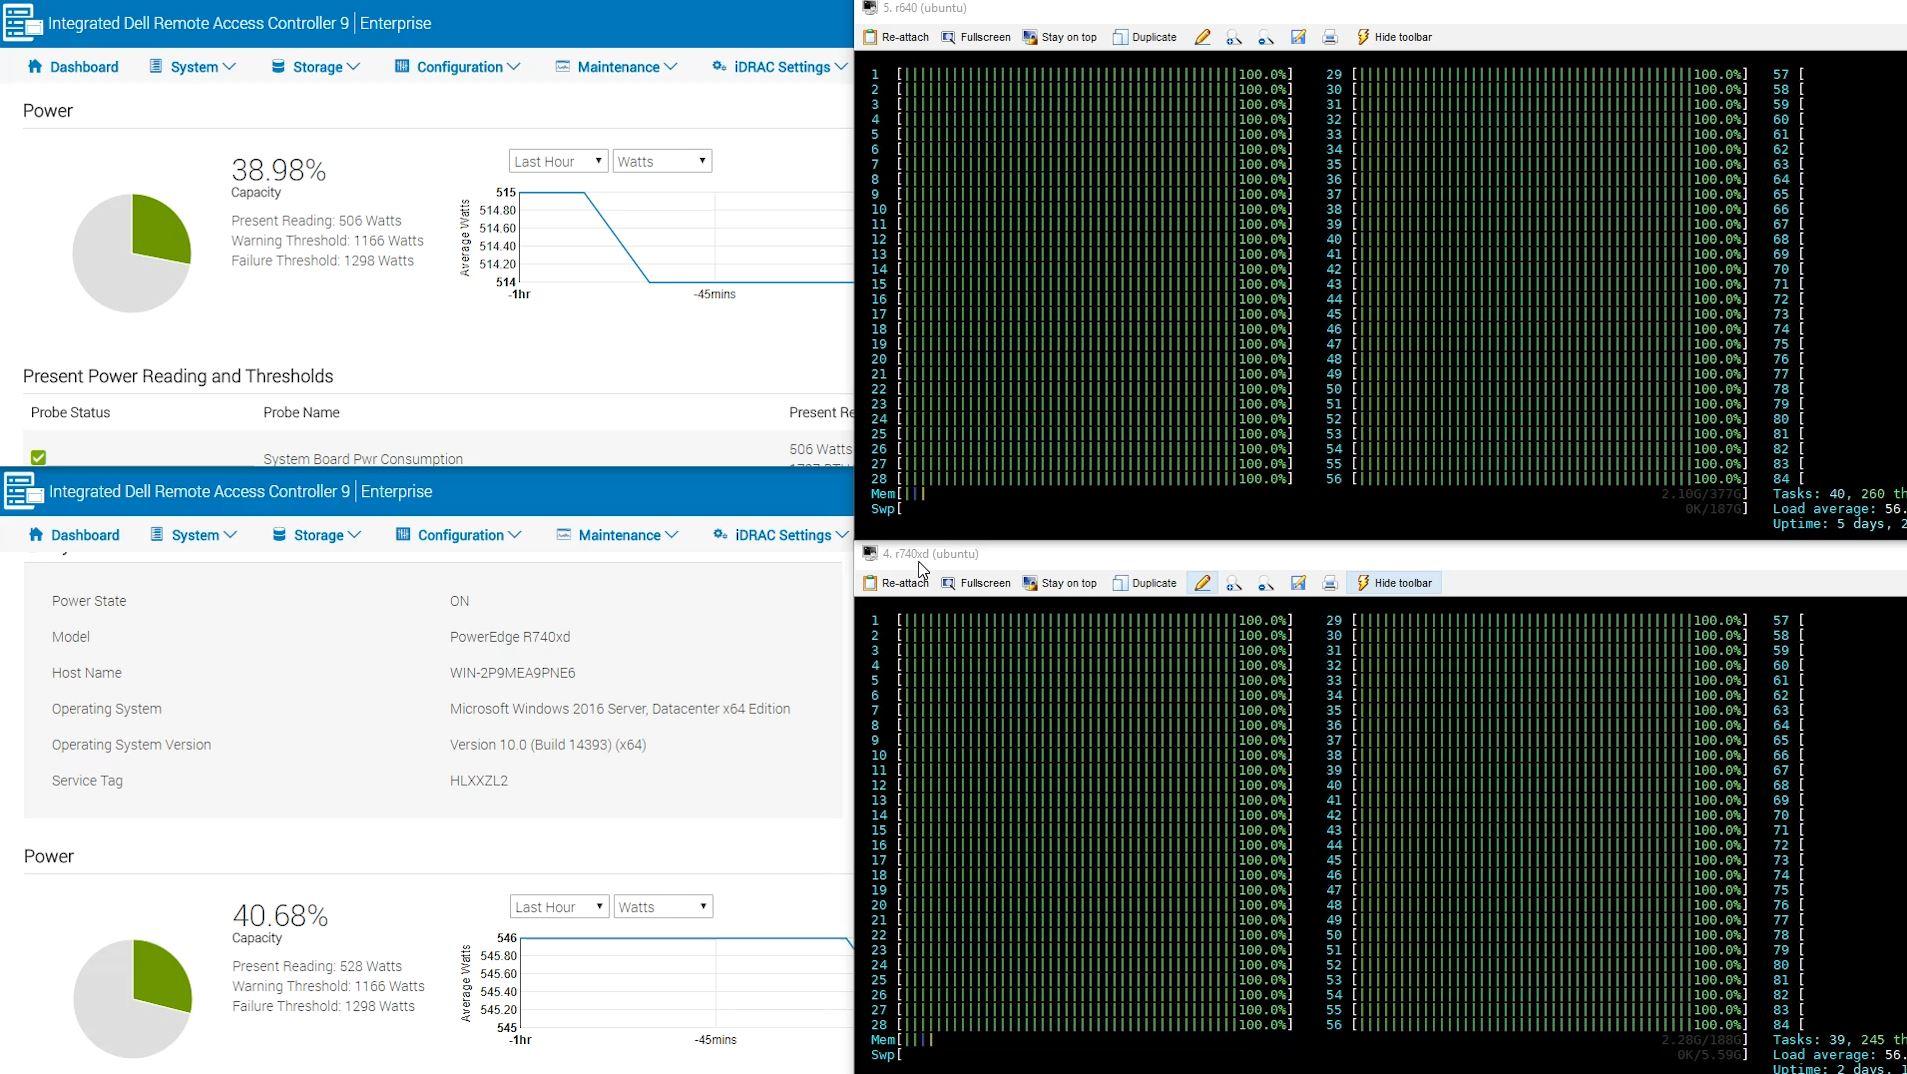 Dell EMC PowerEdge R640 V R740xd Power Consumption